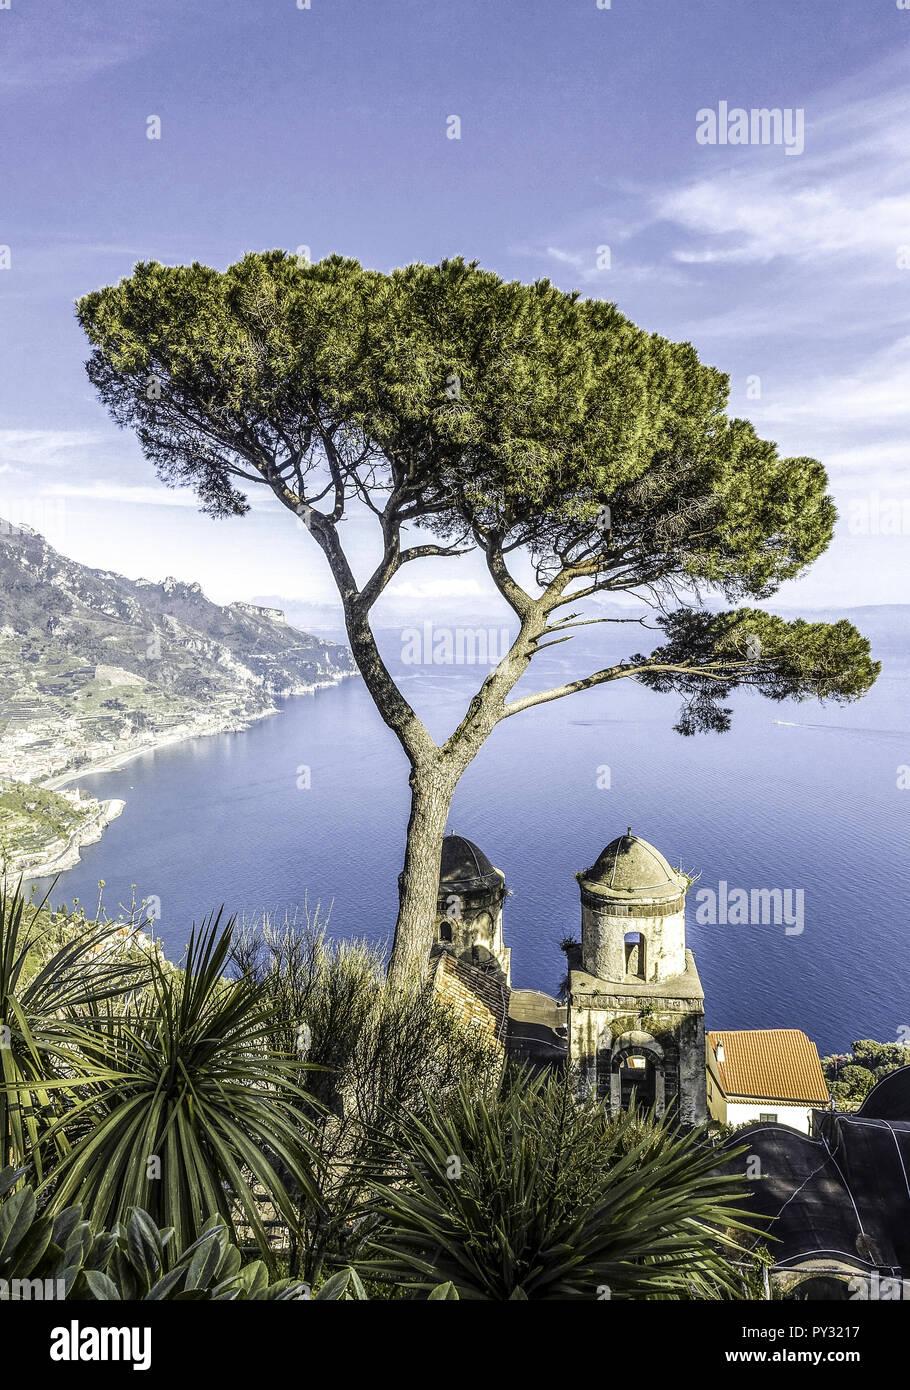 Amalfikueste, Kampanien, Italien - Stock Image